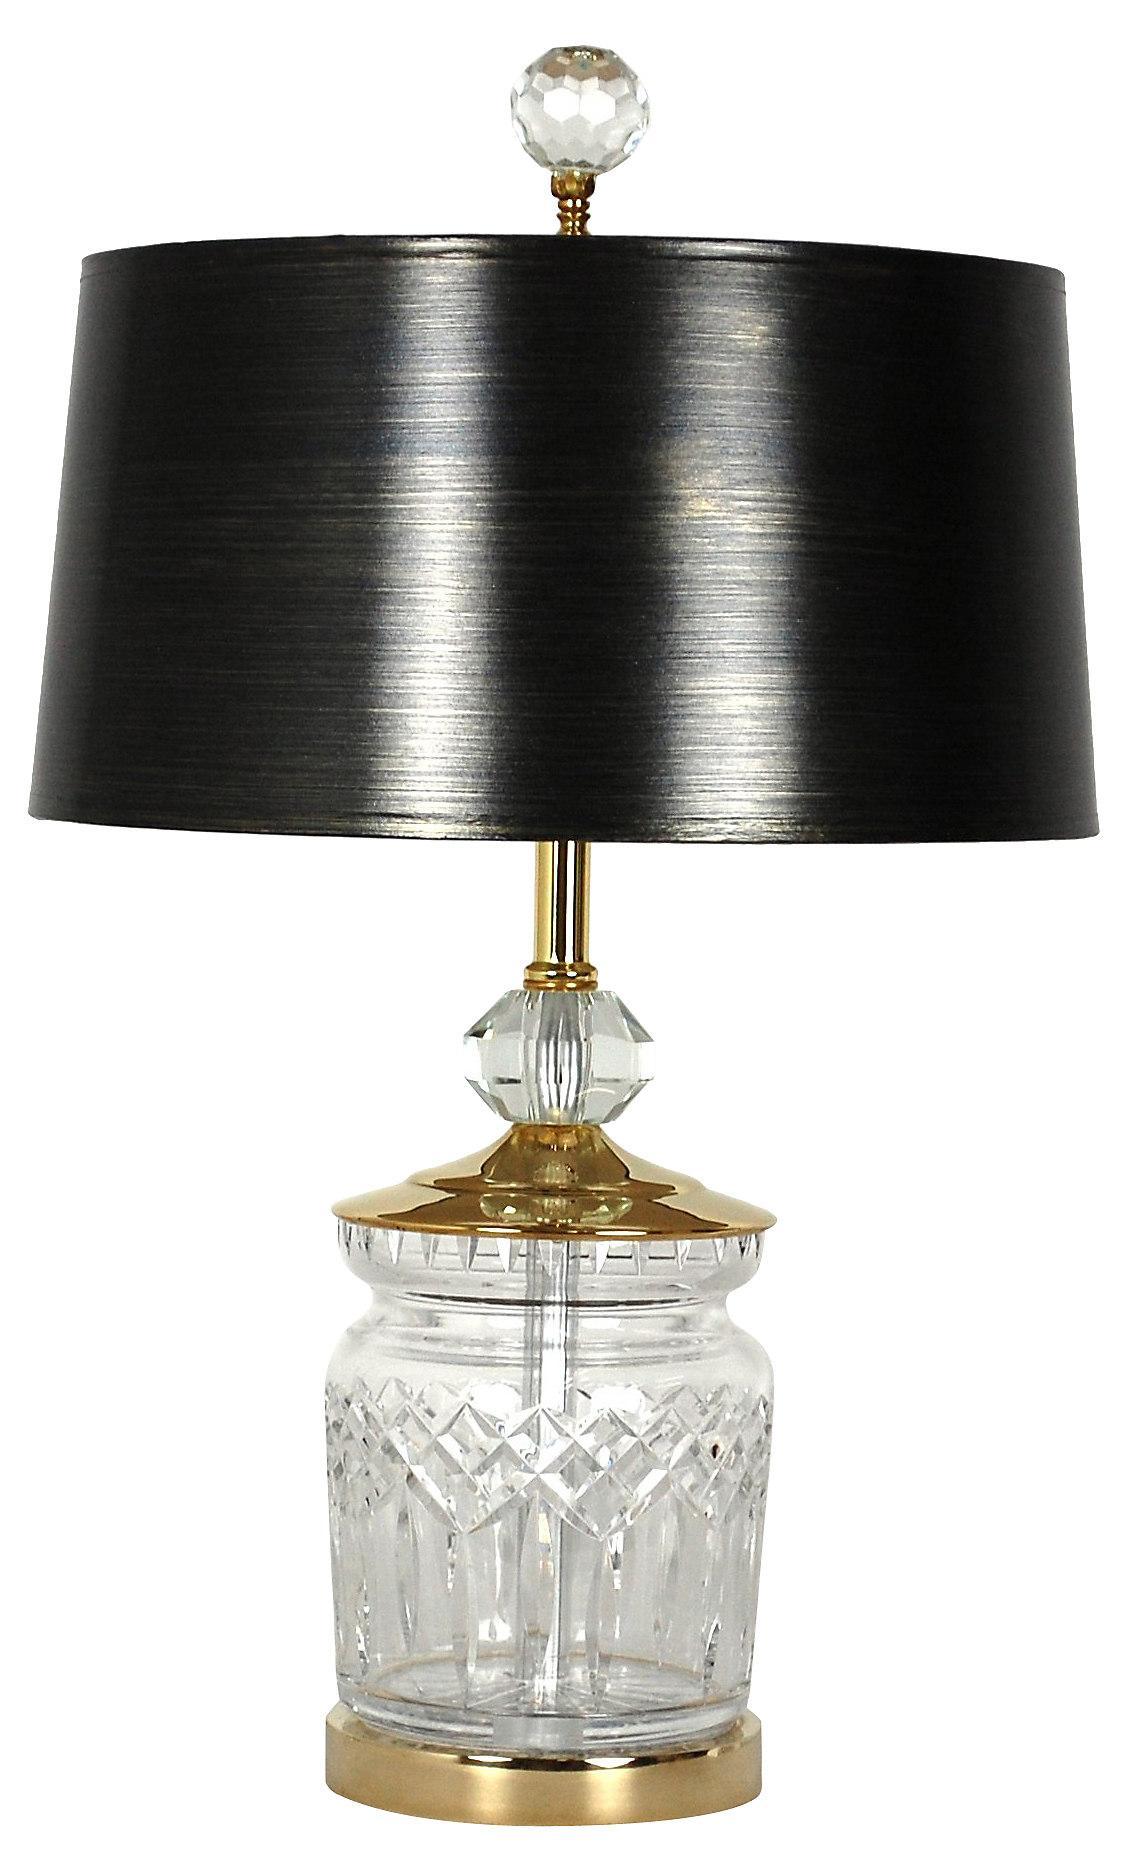 Vintage Waterford Crystal Lamp Chairish